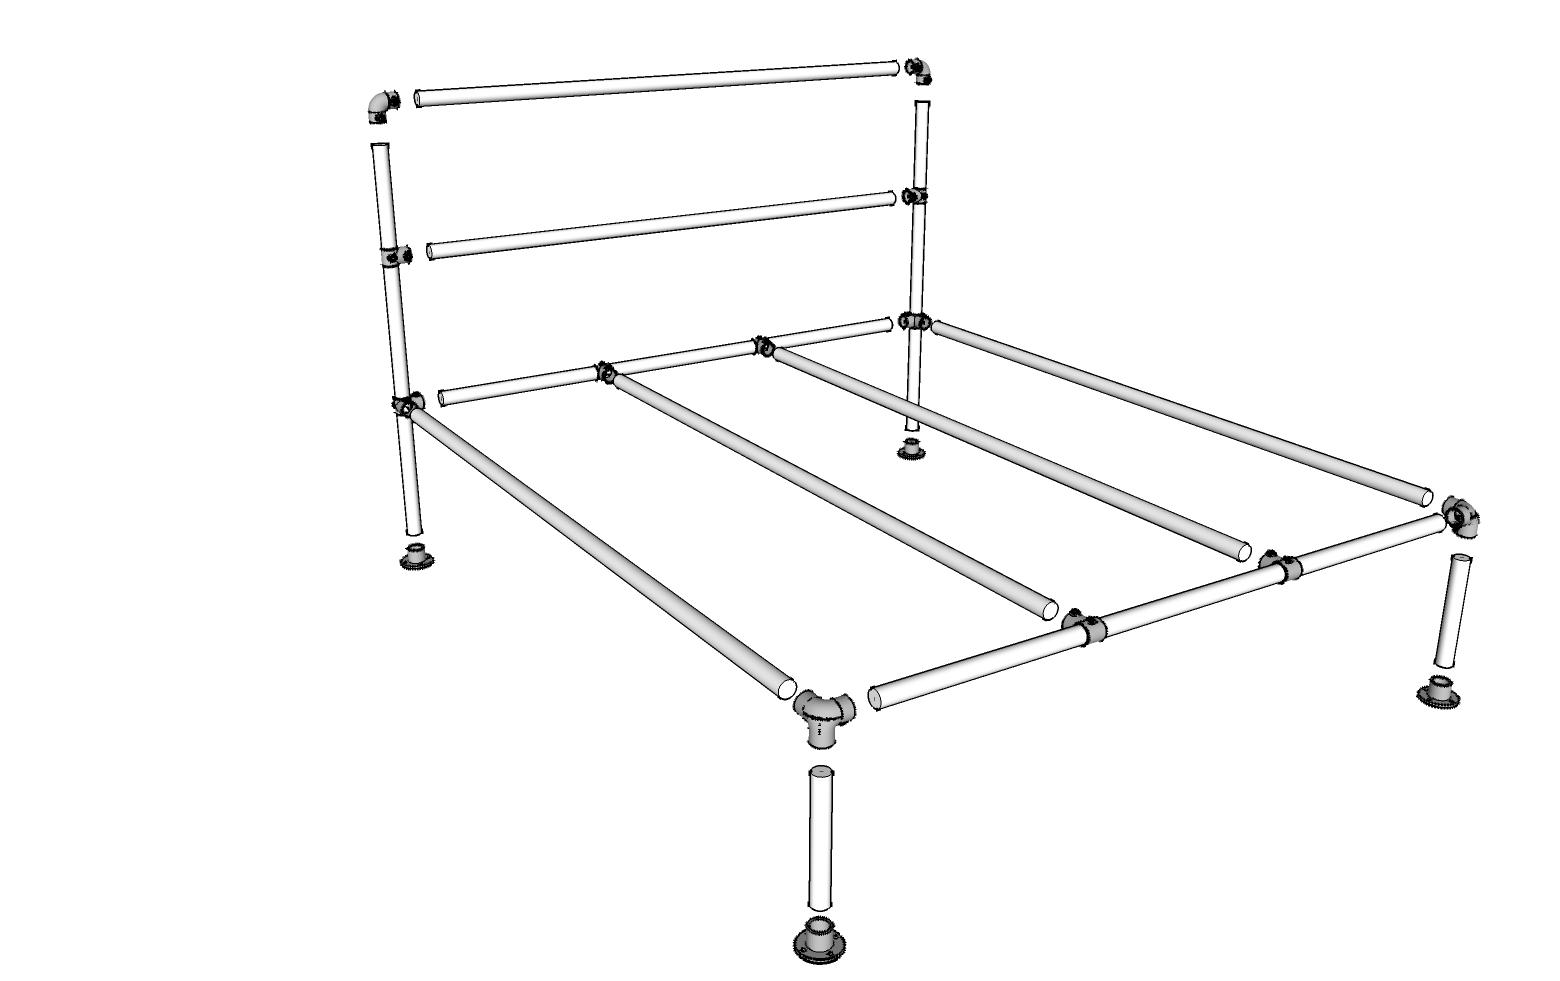 Manhattan Bed Frame Part Bundles Kits Simplified